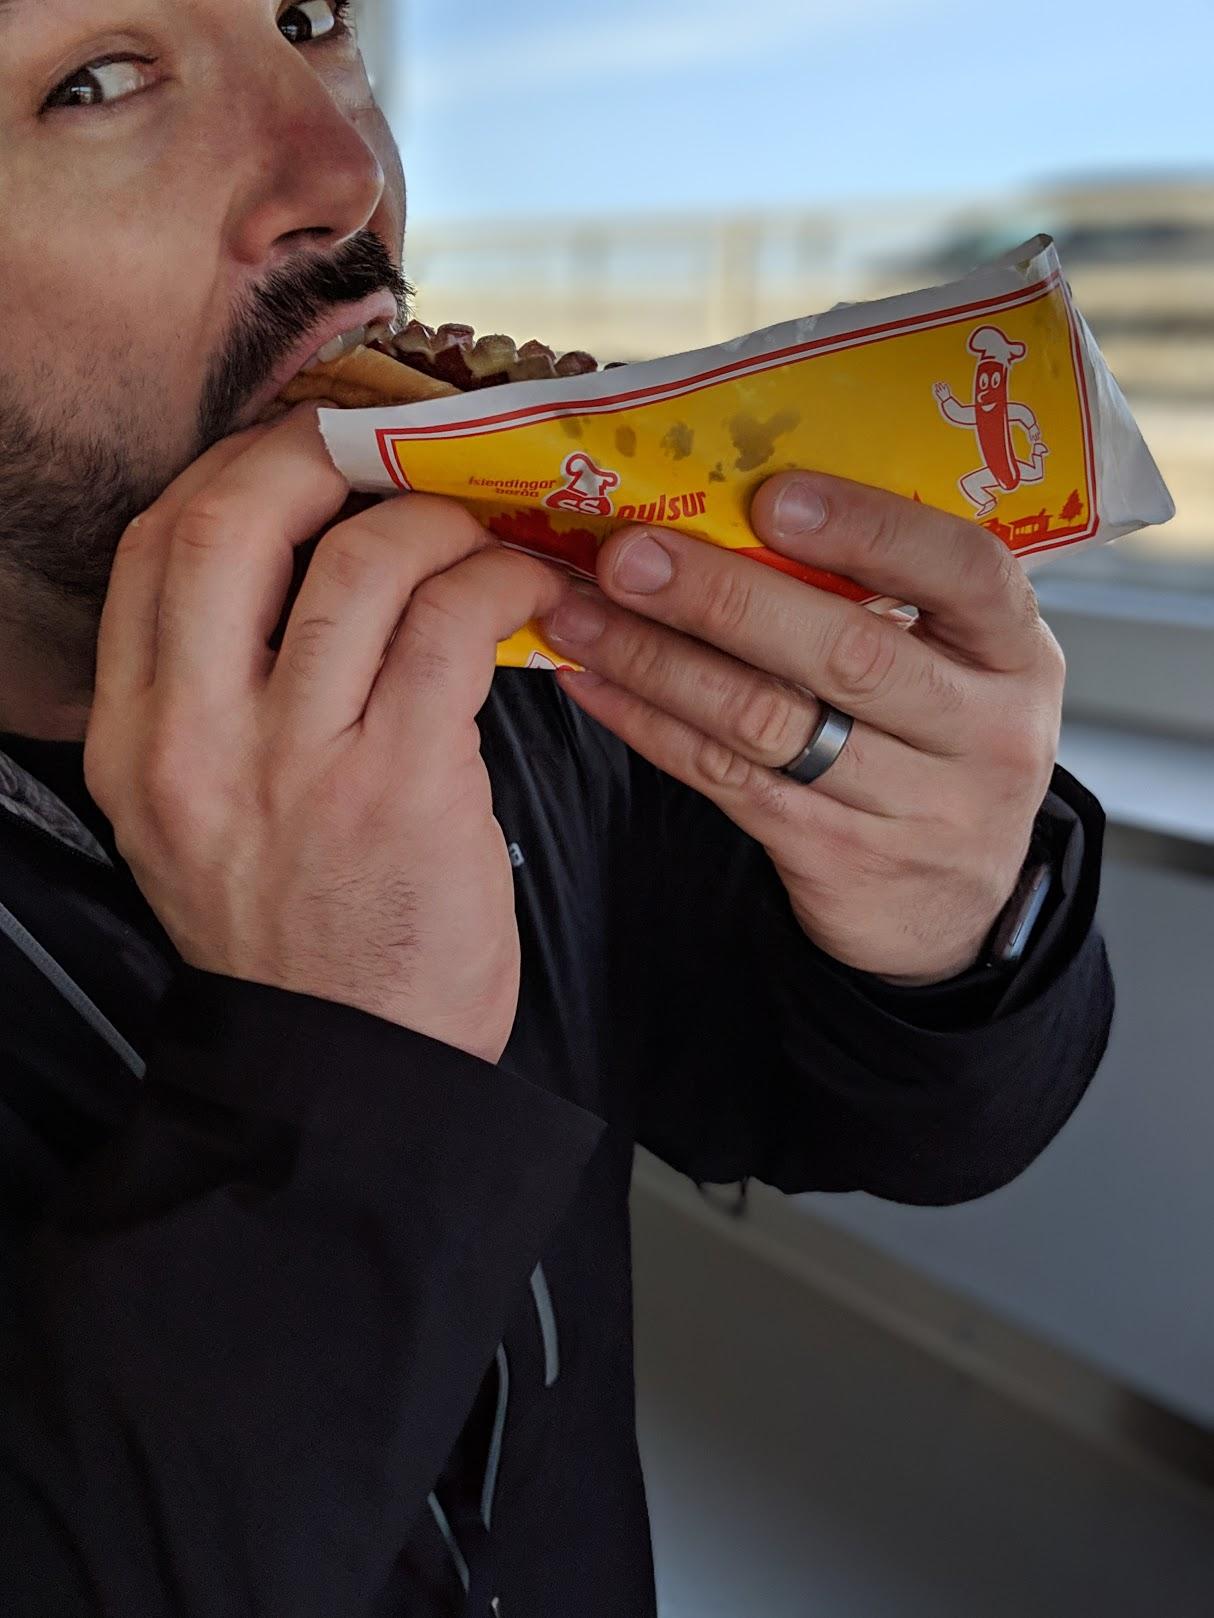 Pylsa aka: Best. Hotdogs. Ever.